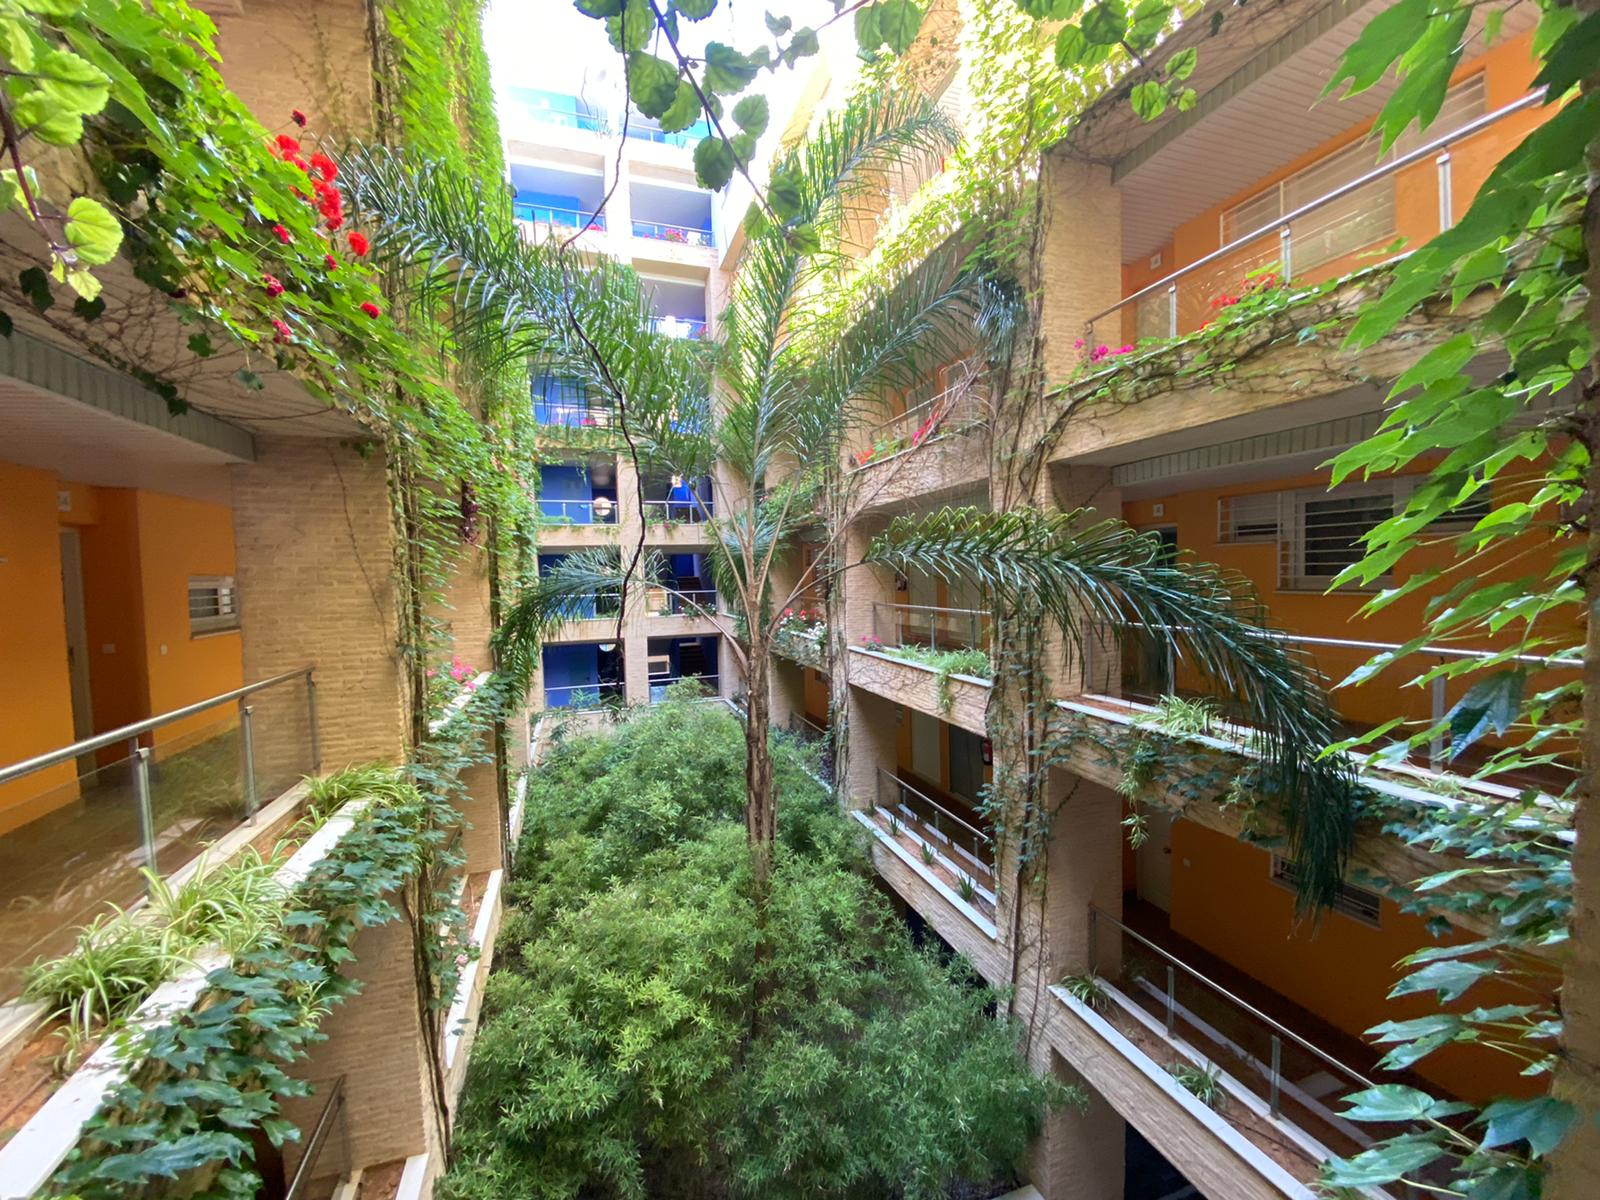 Imagen 33 del Apartamento en El Espigón, 1ª Planta nº4 Poniente (3d+2b), Punta del Moral (HUELVA), Paseo de la Cruz nº22